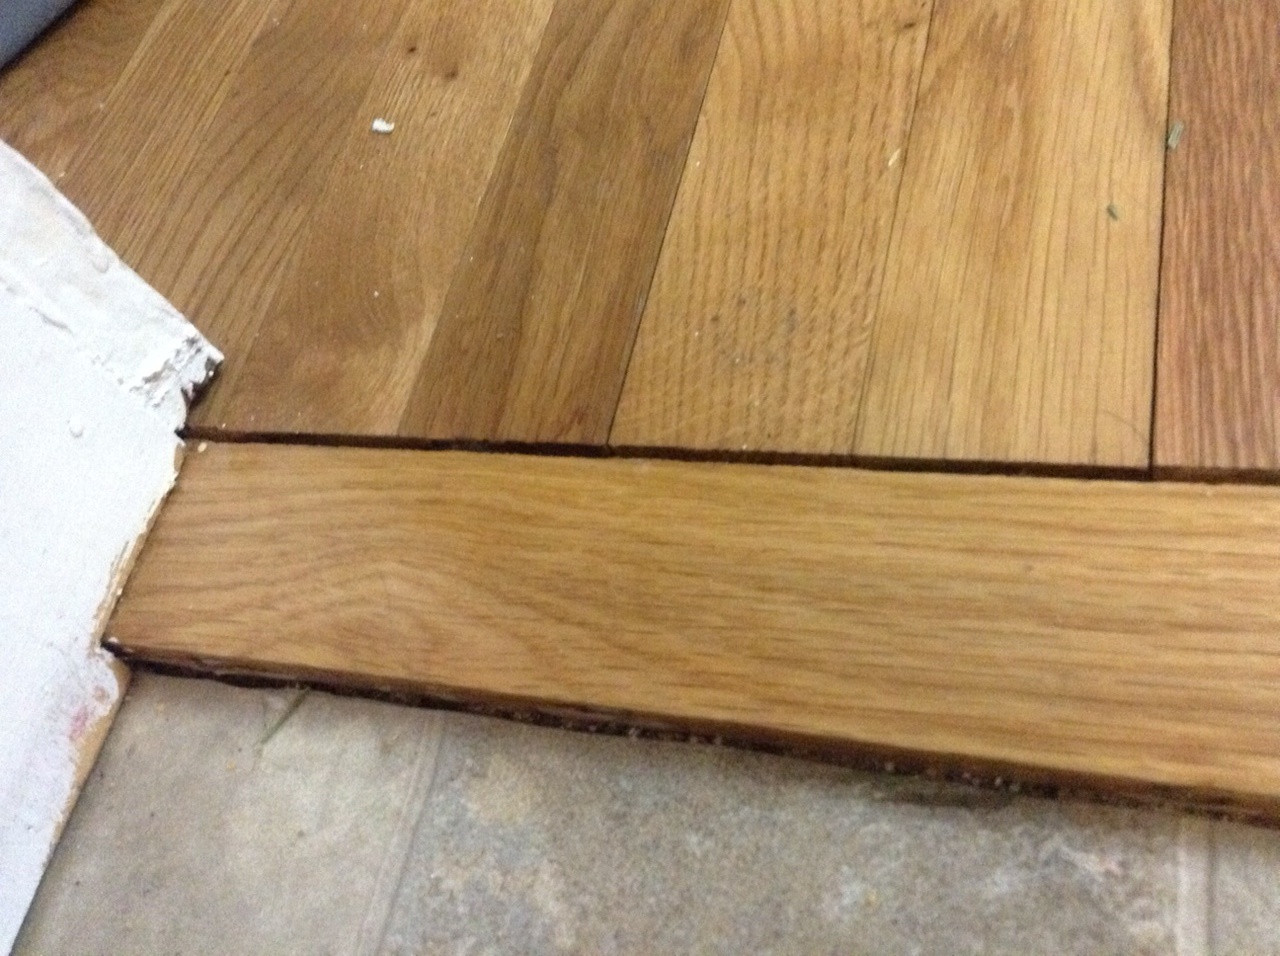 hardwood floor finishes review of wood floor techniques 101 inside gap shrinkage cork